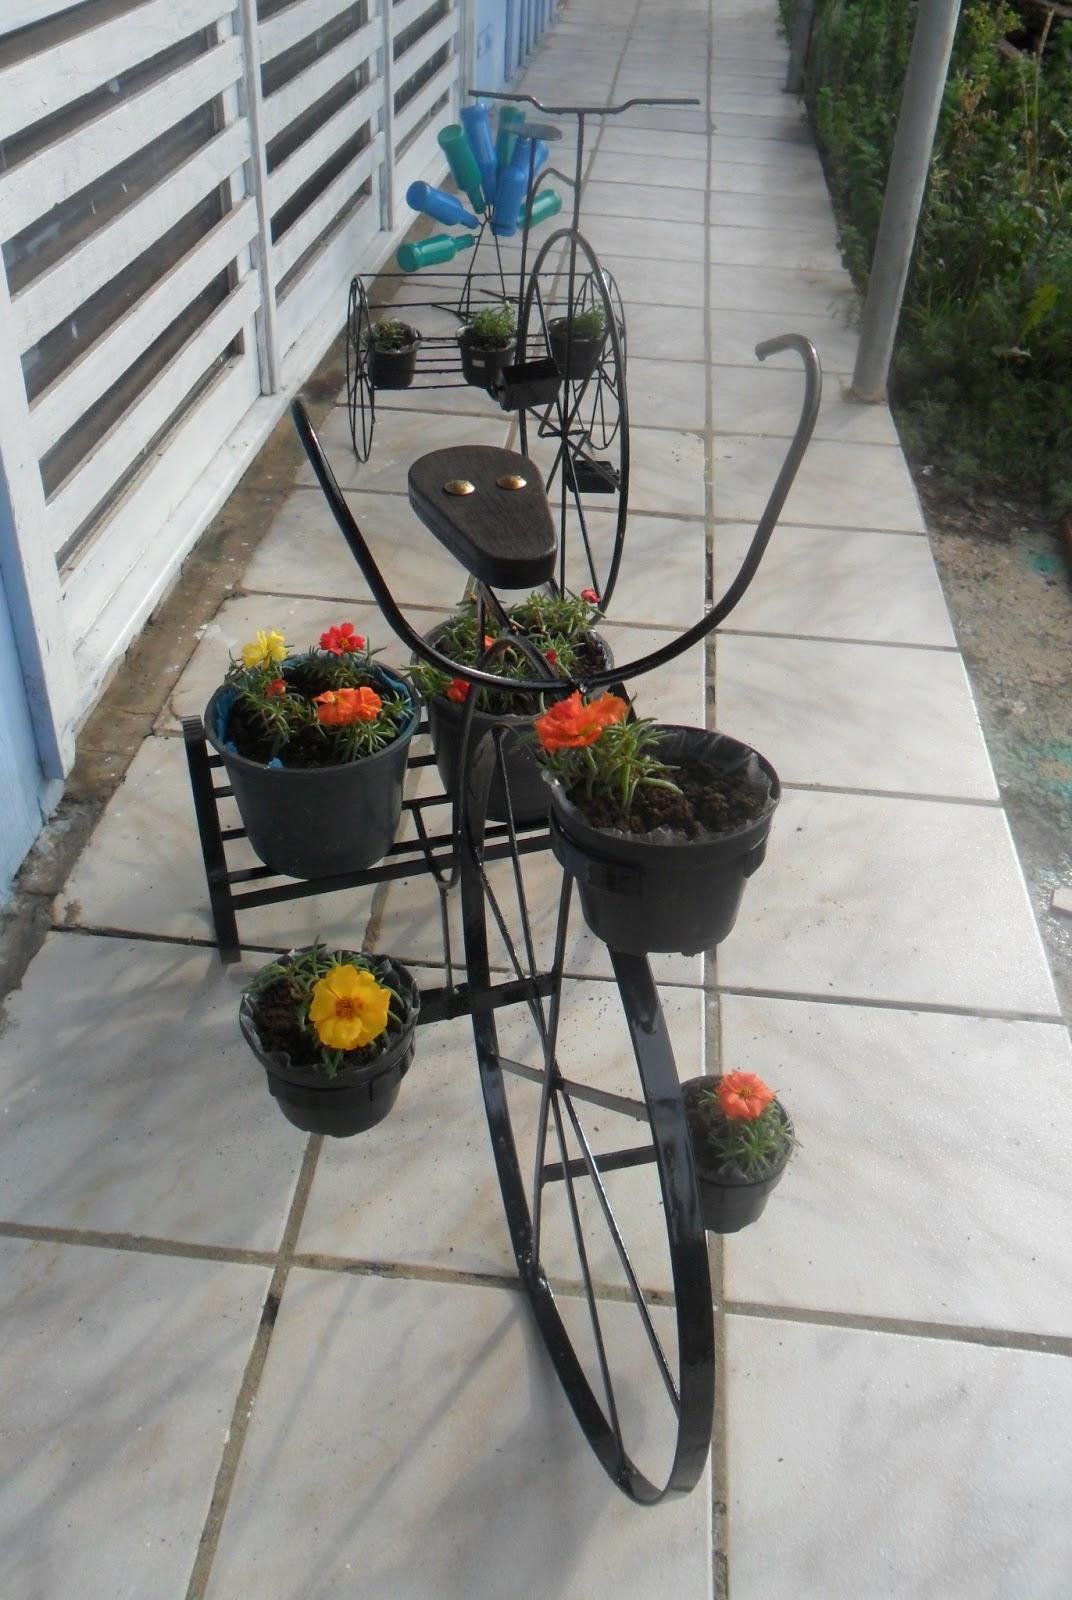 enfeite jardim bicicleta:Art Ferro: Mini bicicleta para jardim